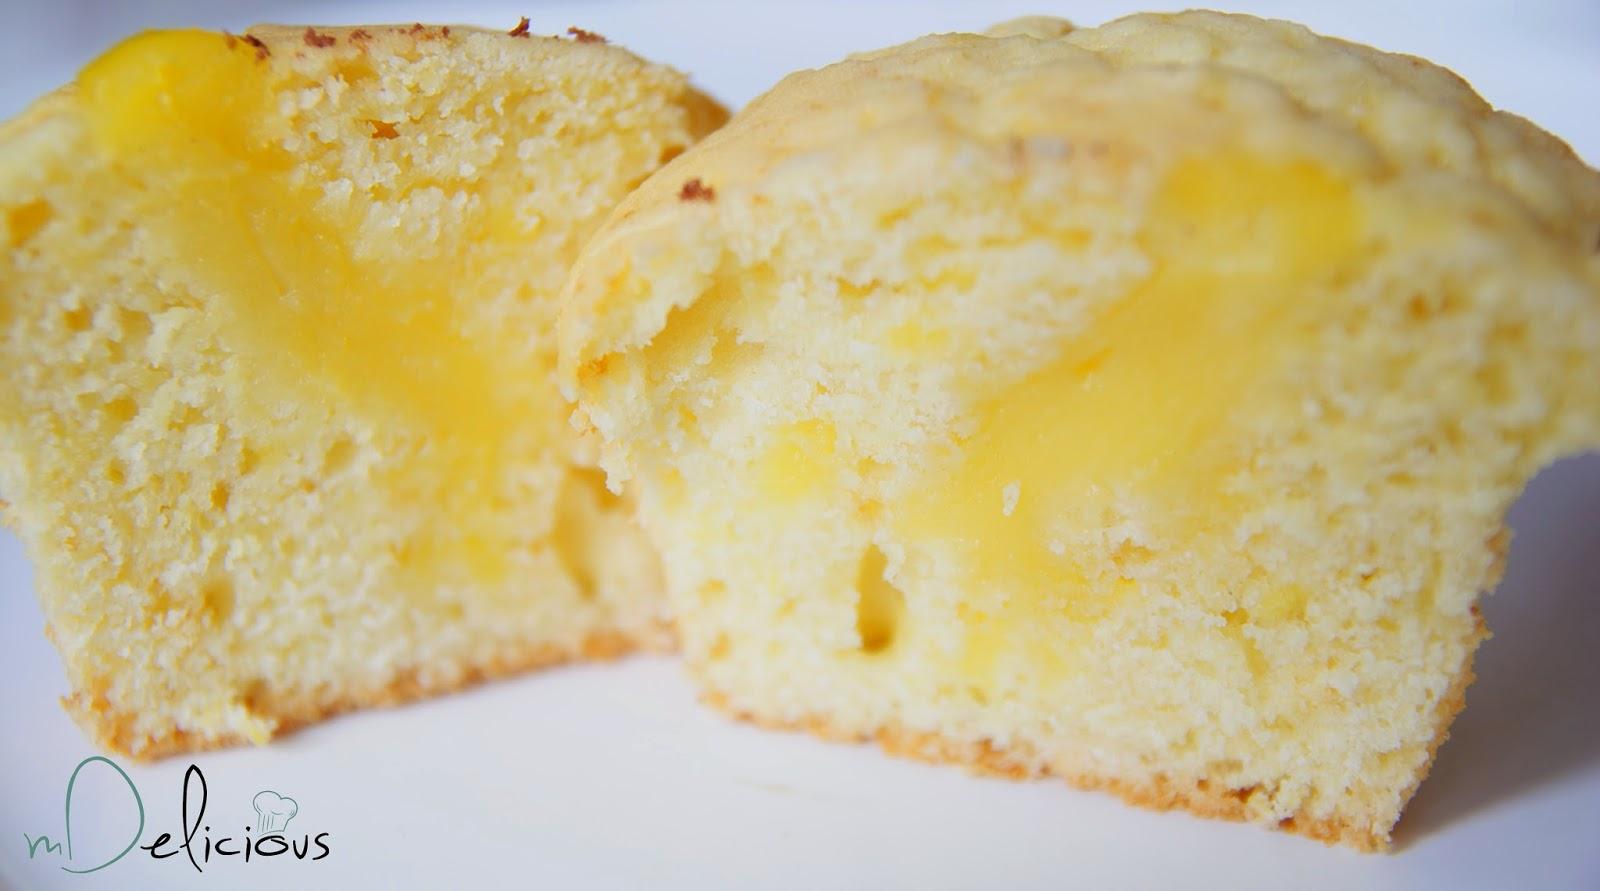 muffiny jogurtowe, muffinki cytrynowe, muffinki z lemon curd, babeczki cytrynowe, babeczki jogurtowe